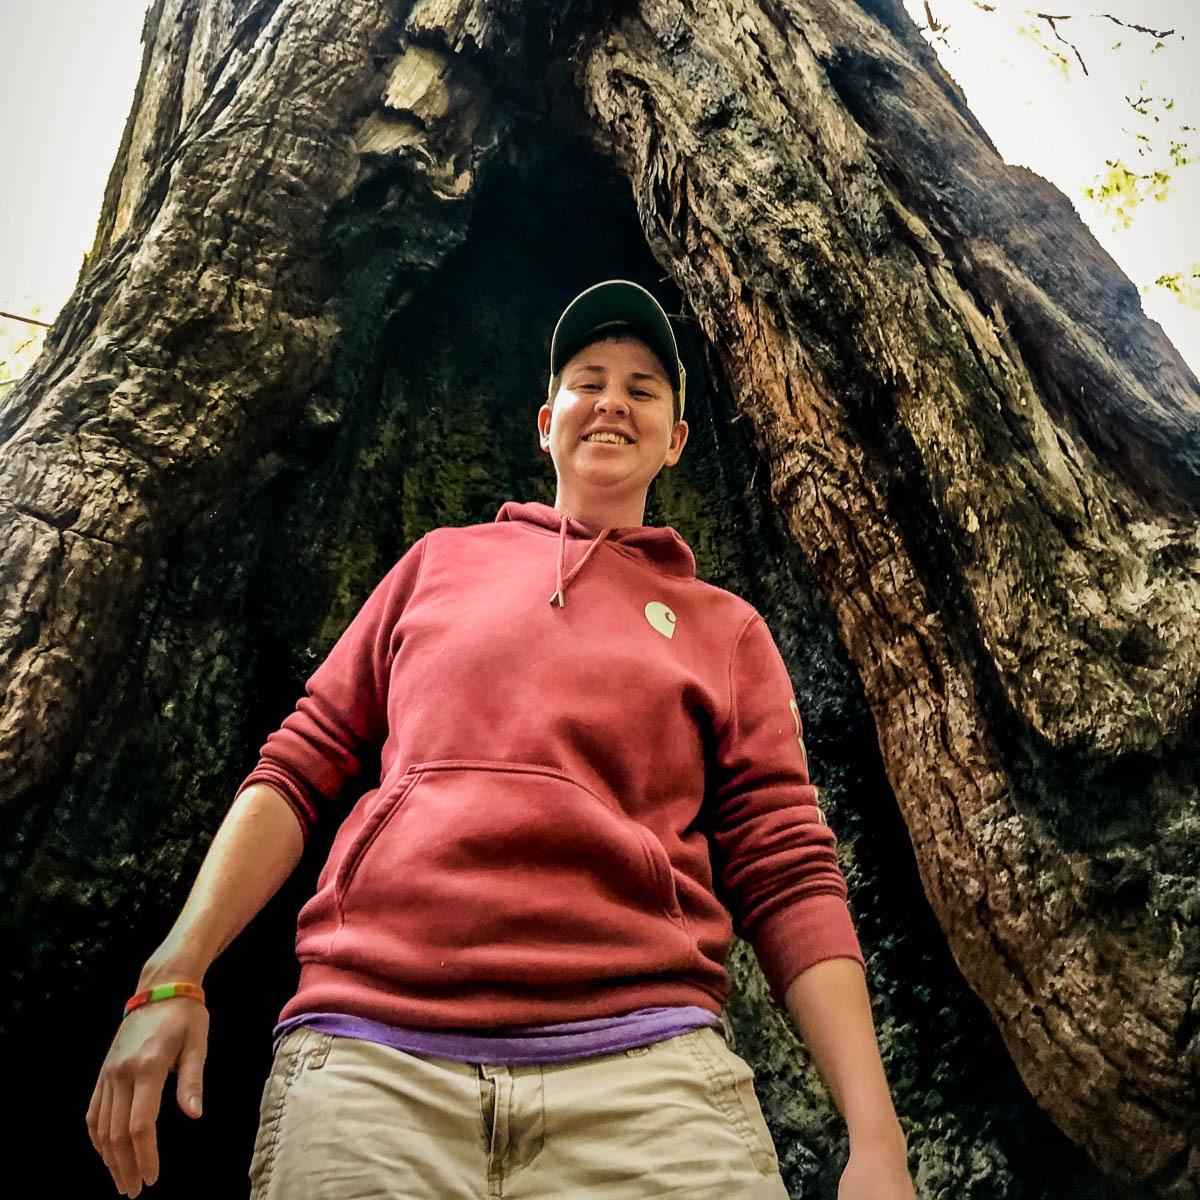 Kristen Ragusa standing next to a tree